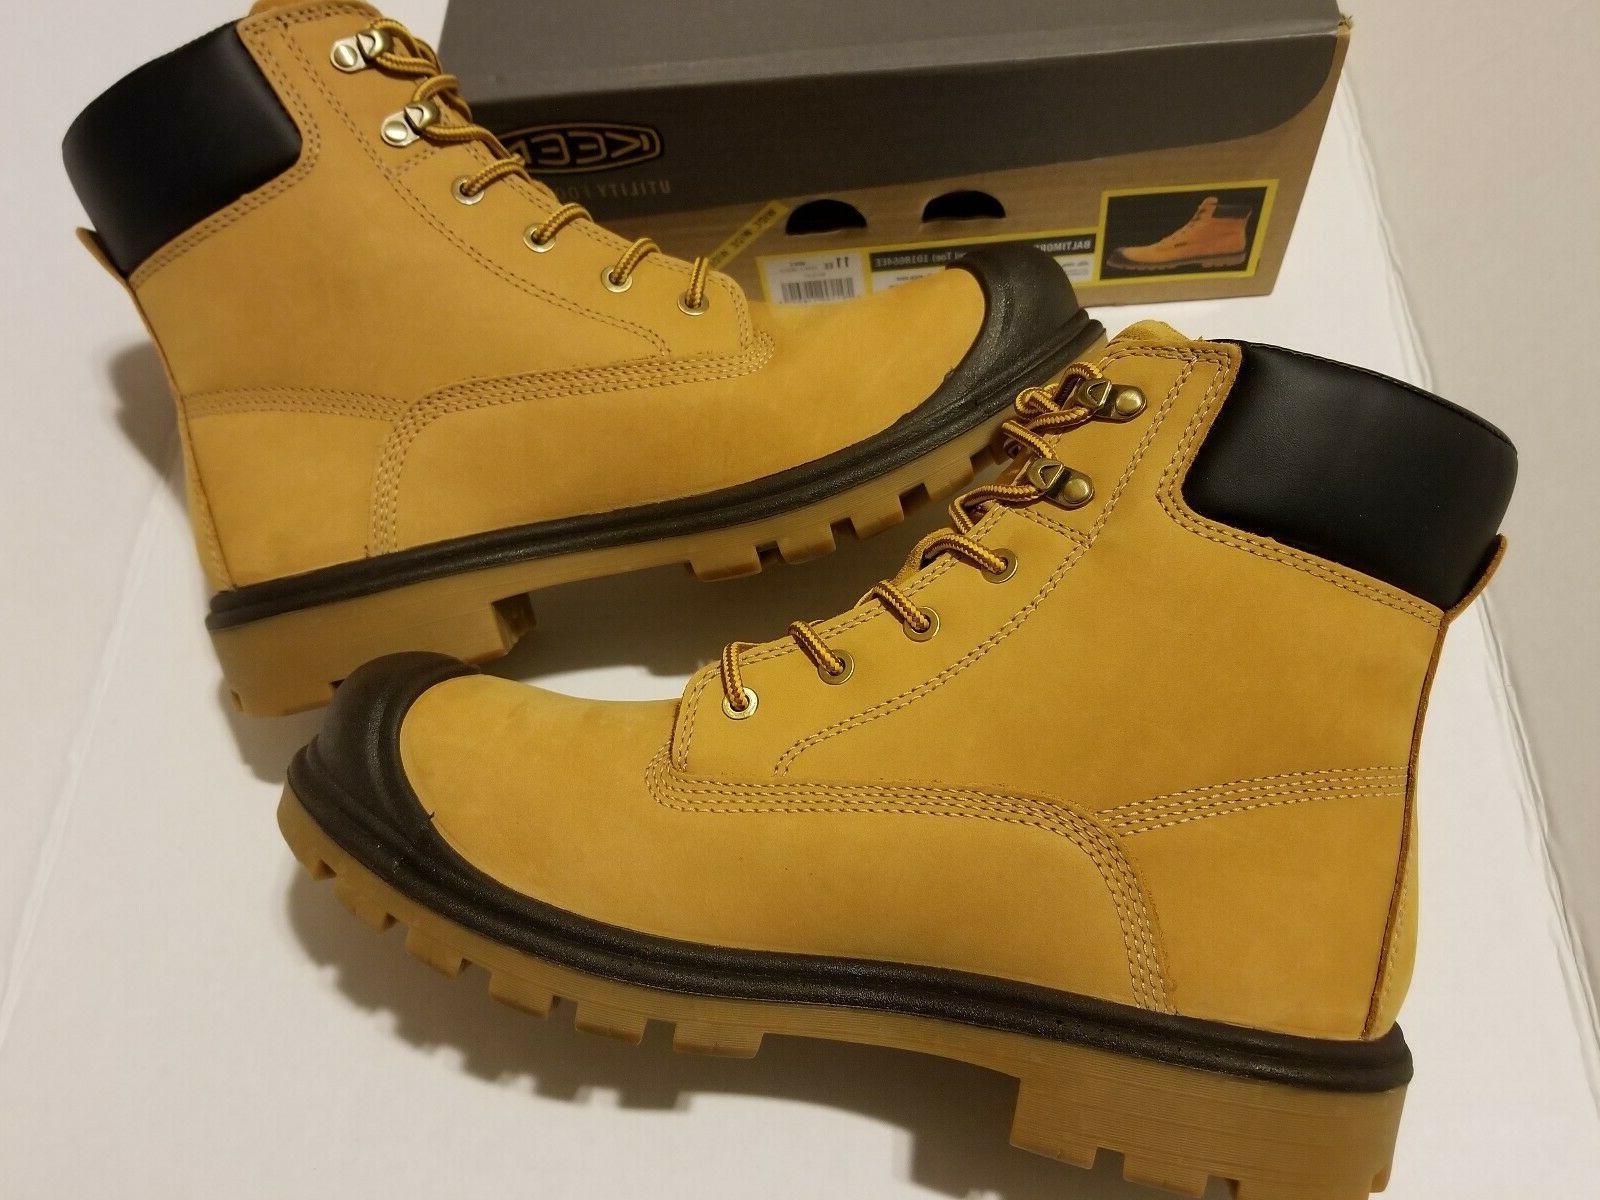 "6"" WP Wheat Work Boots MEN'S SZ 11 EE"